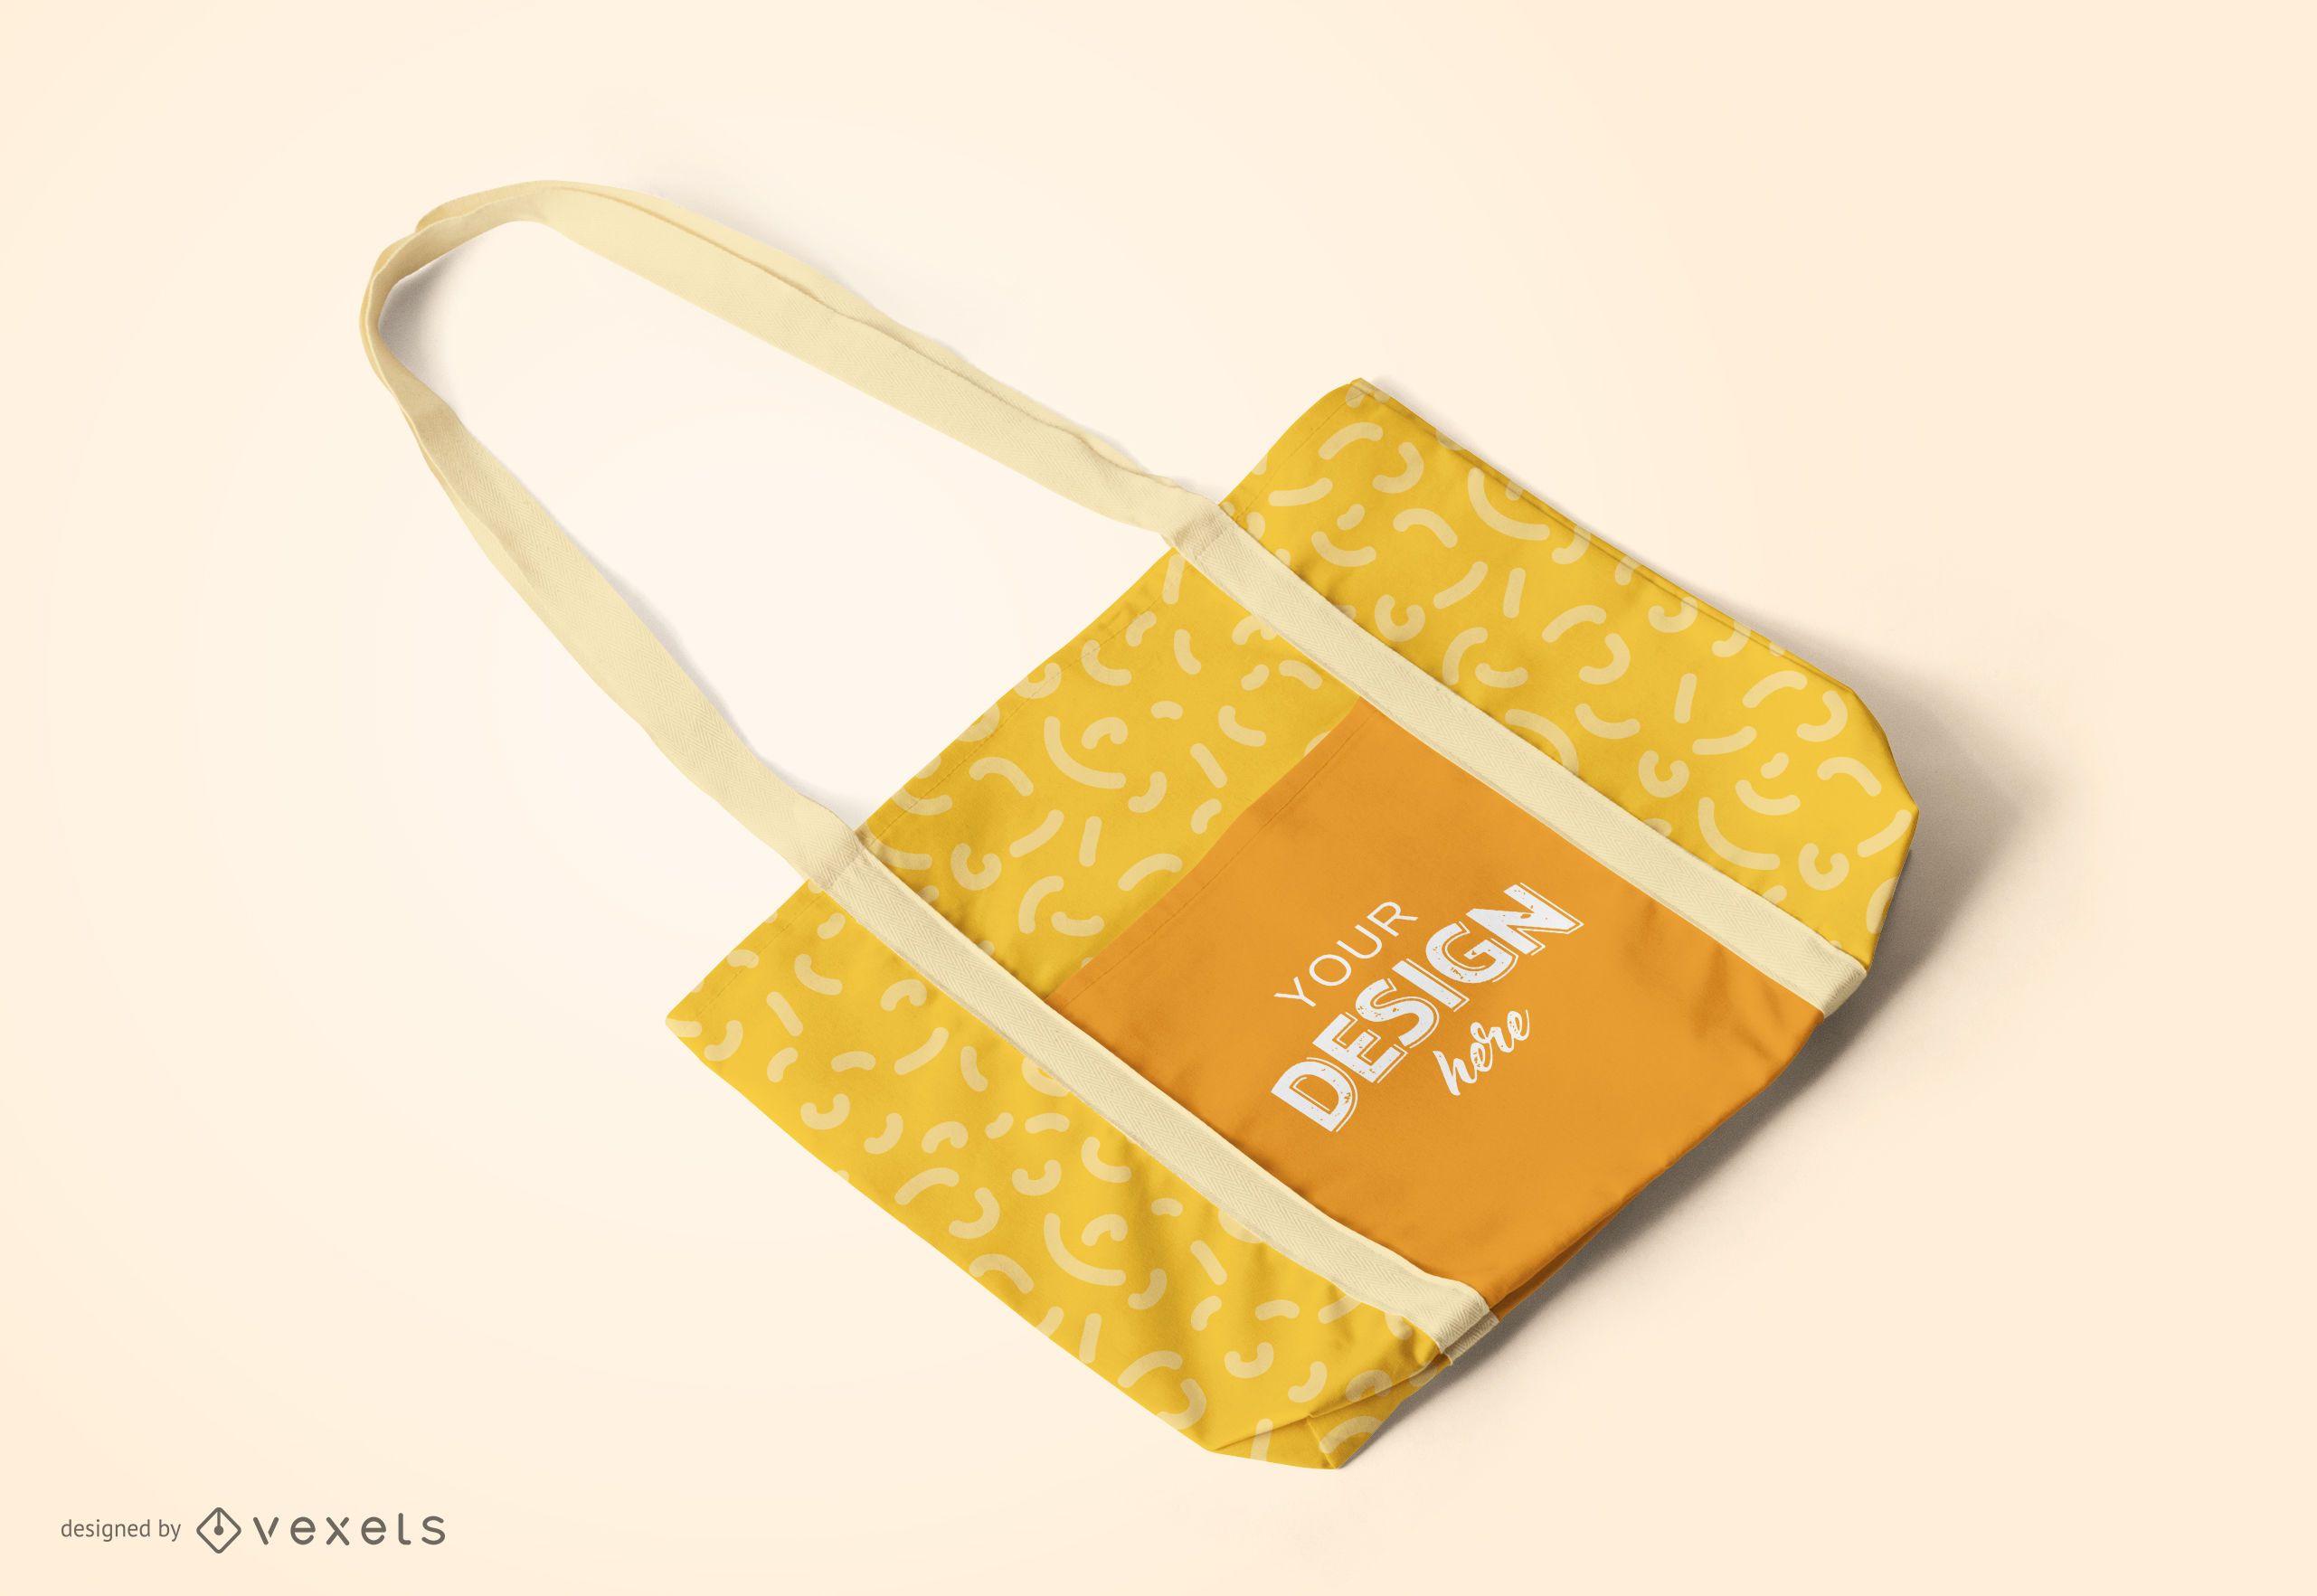 Diseño de maqueta de bolso de mano